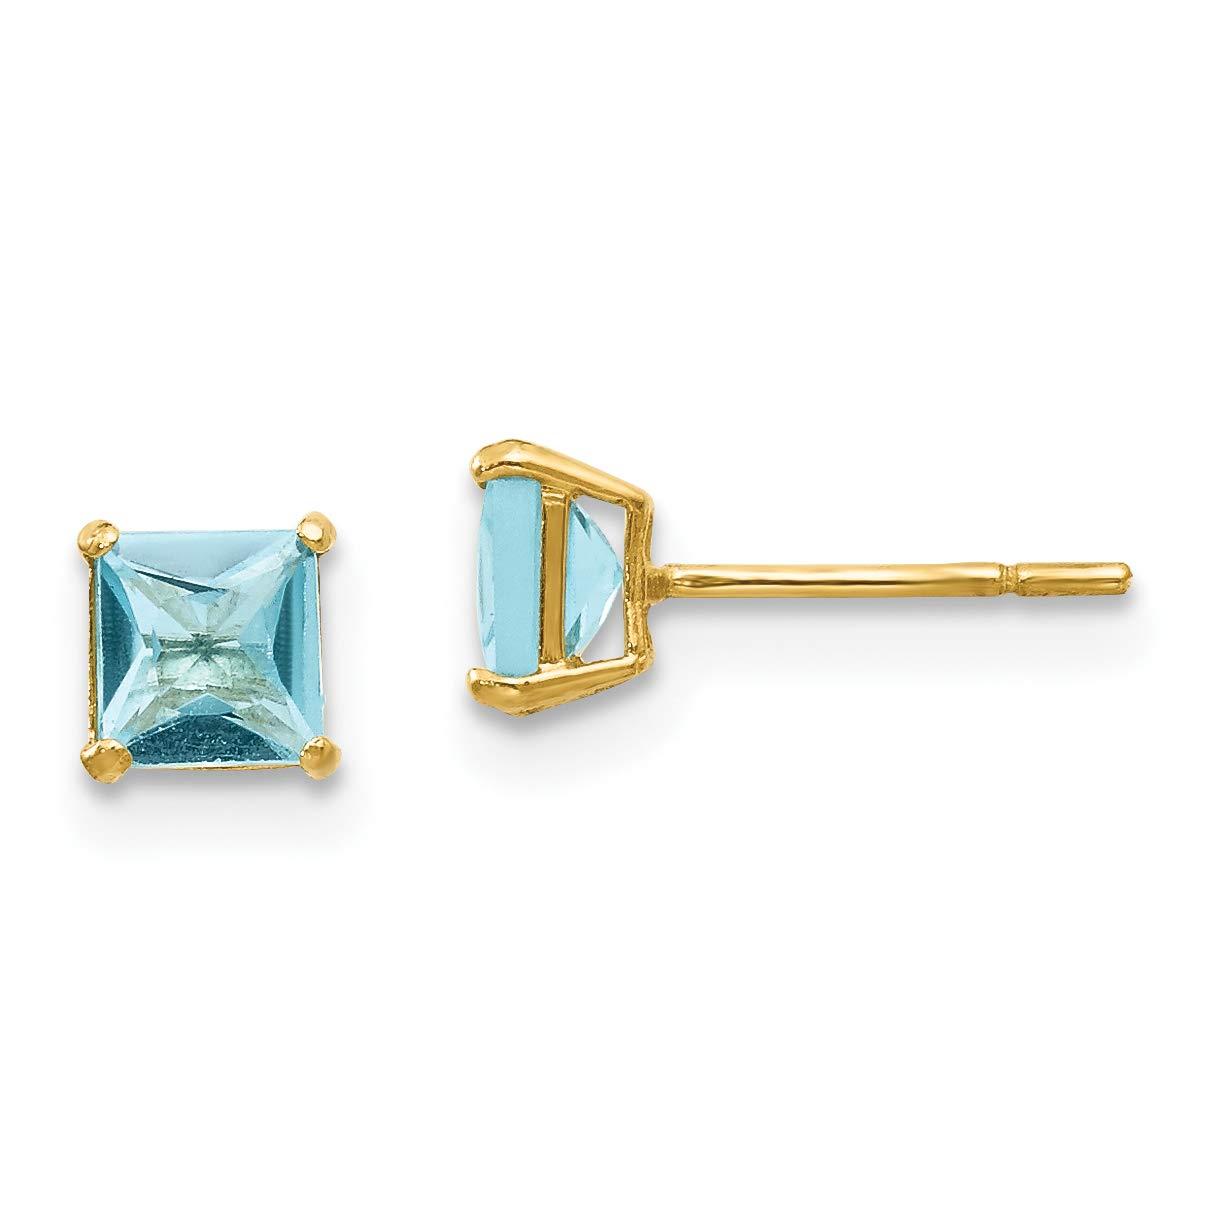 14K Yellow Gold Madi K Childrens 4 MM Square Blue Topaz Post Stud Earrings